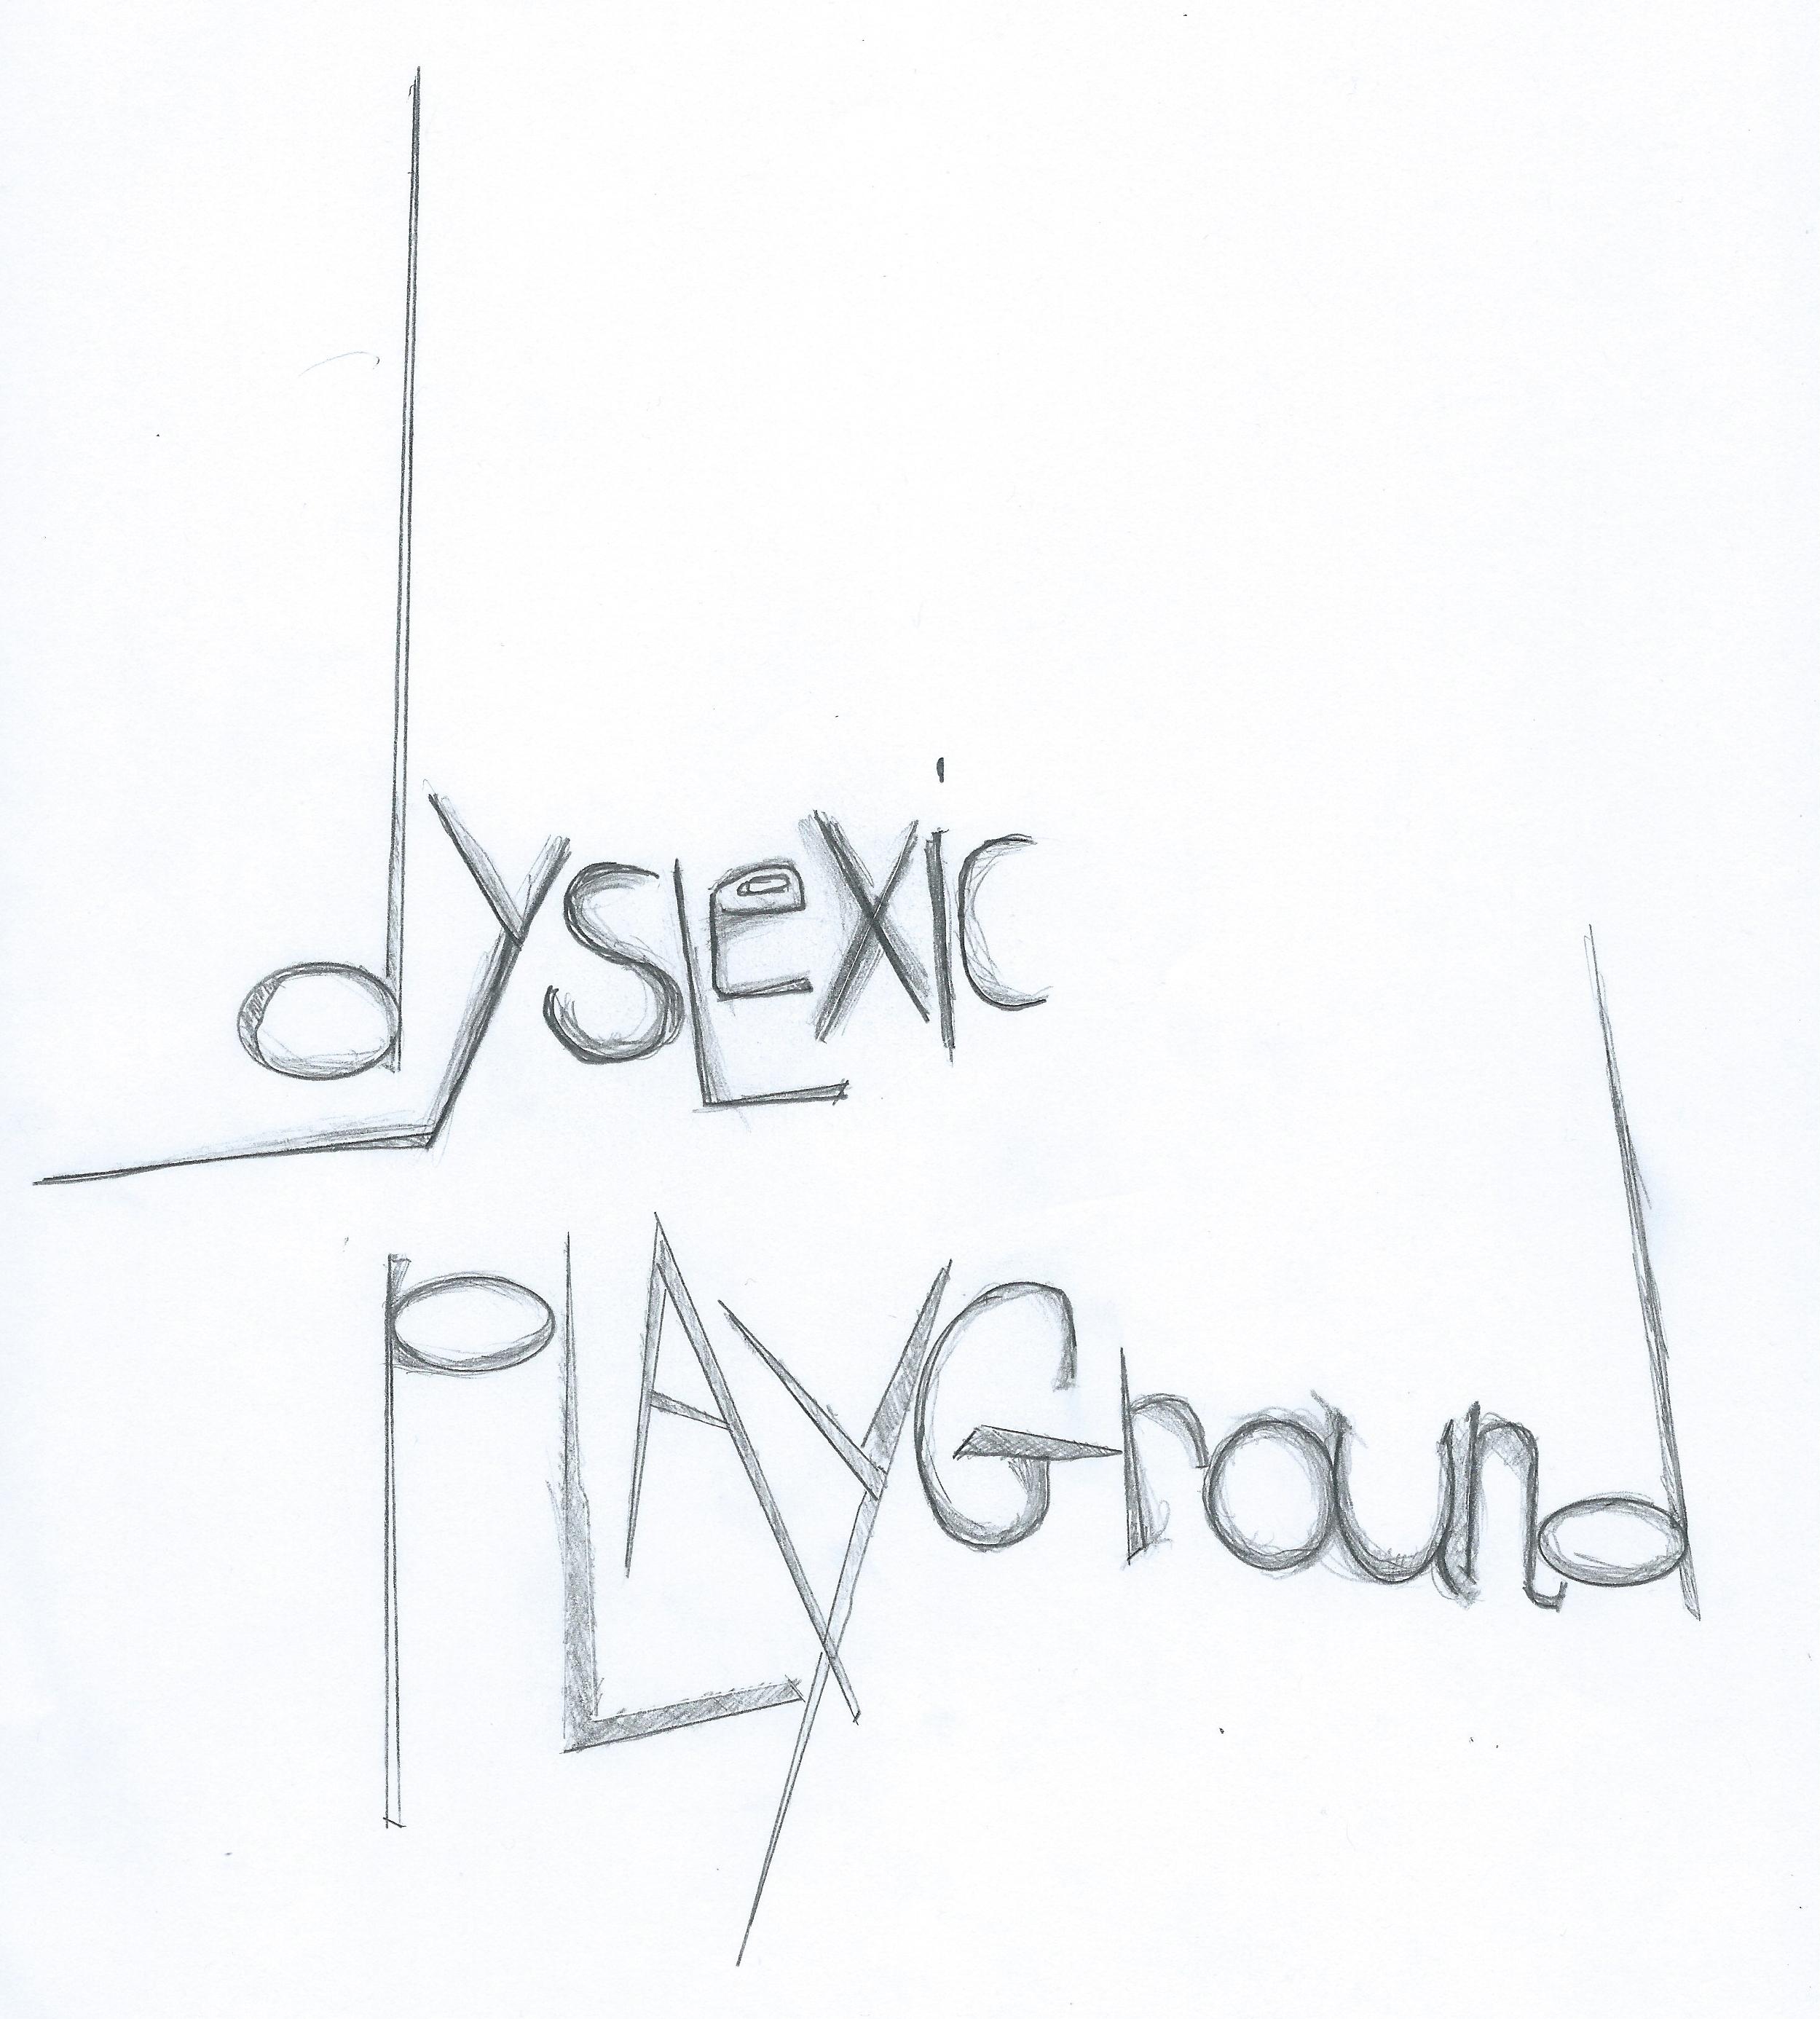 Dyslexic Playground